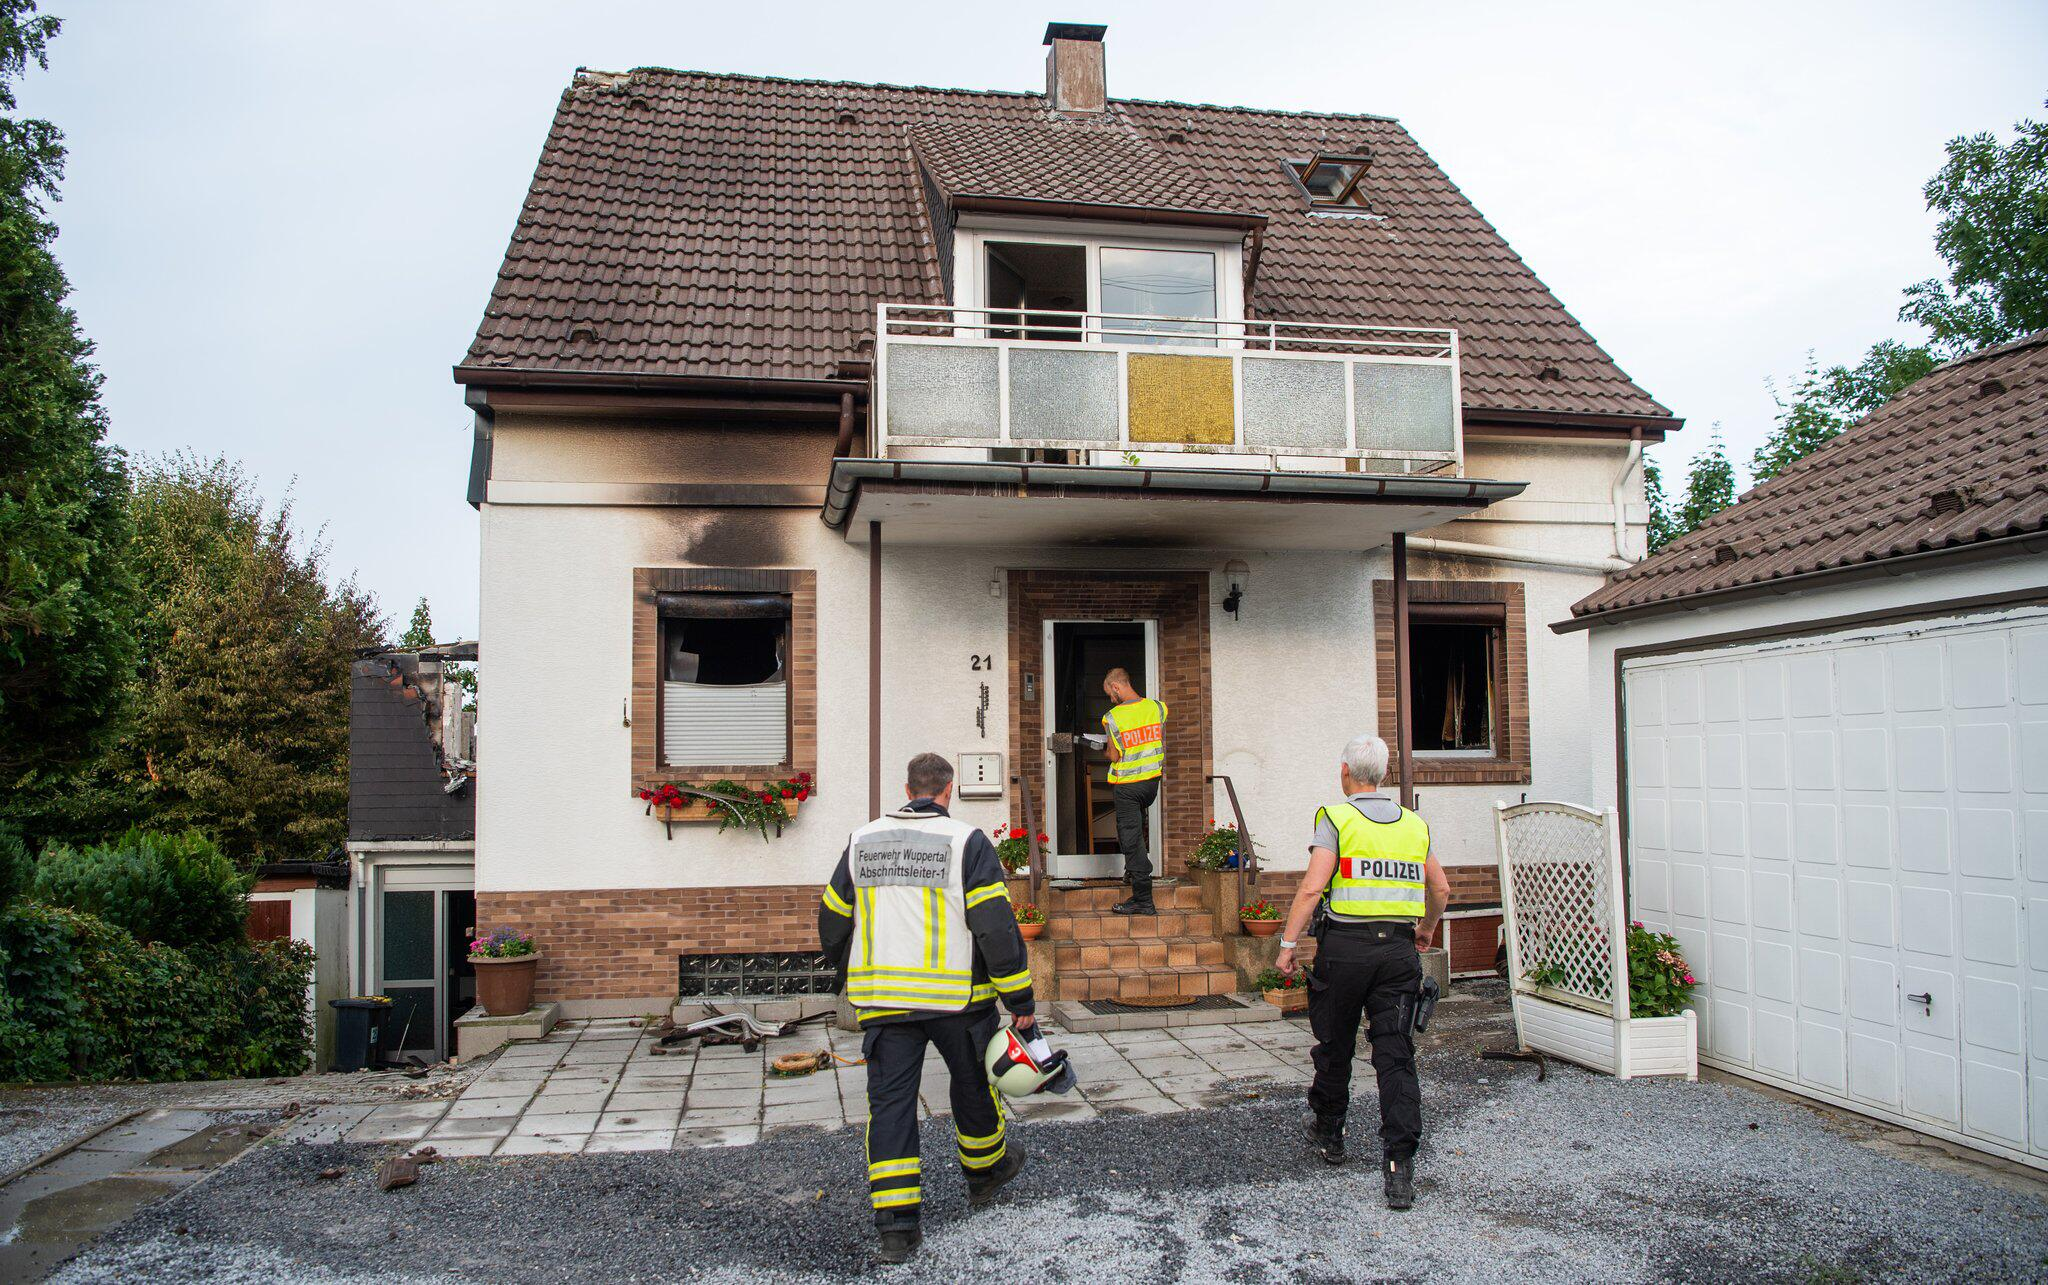 Bild zu House fire in Wuppertal